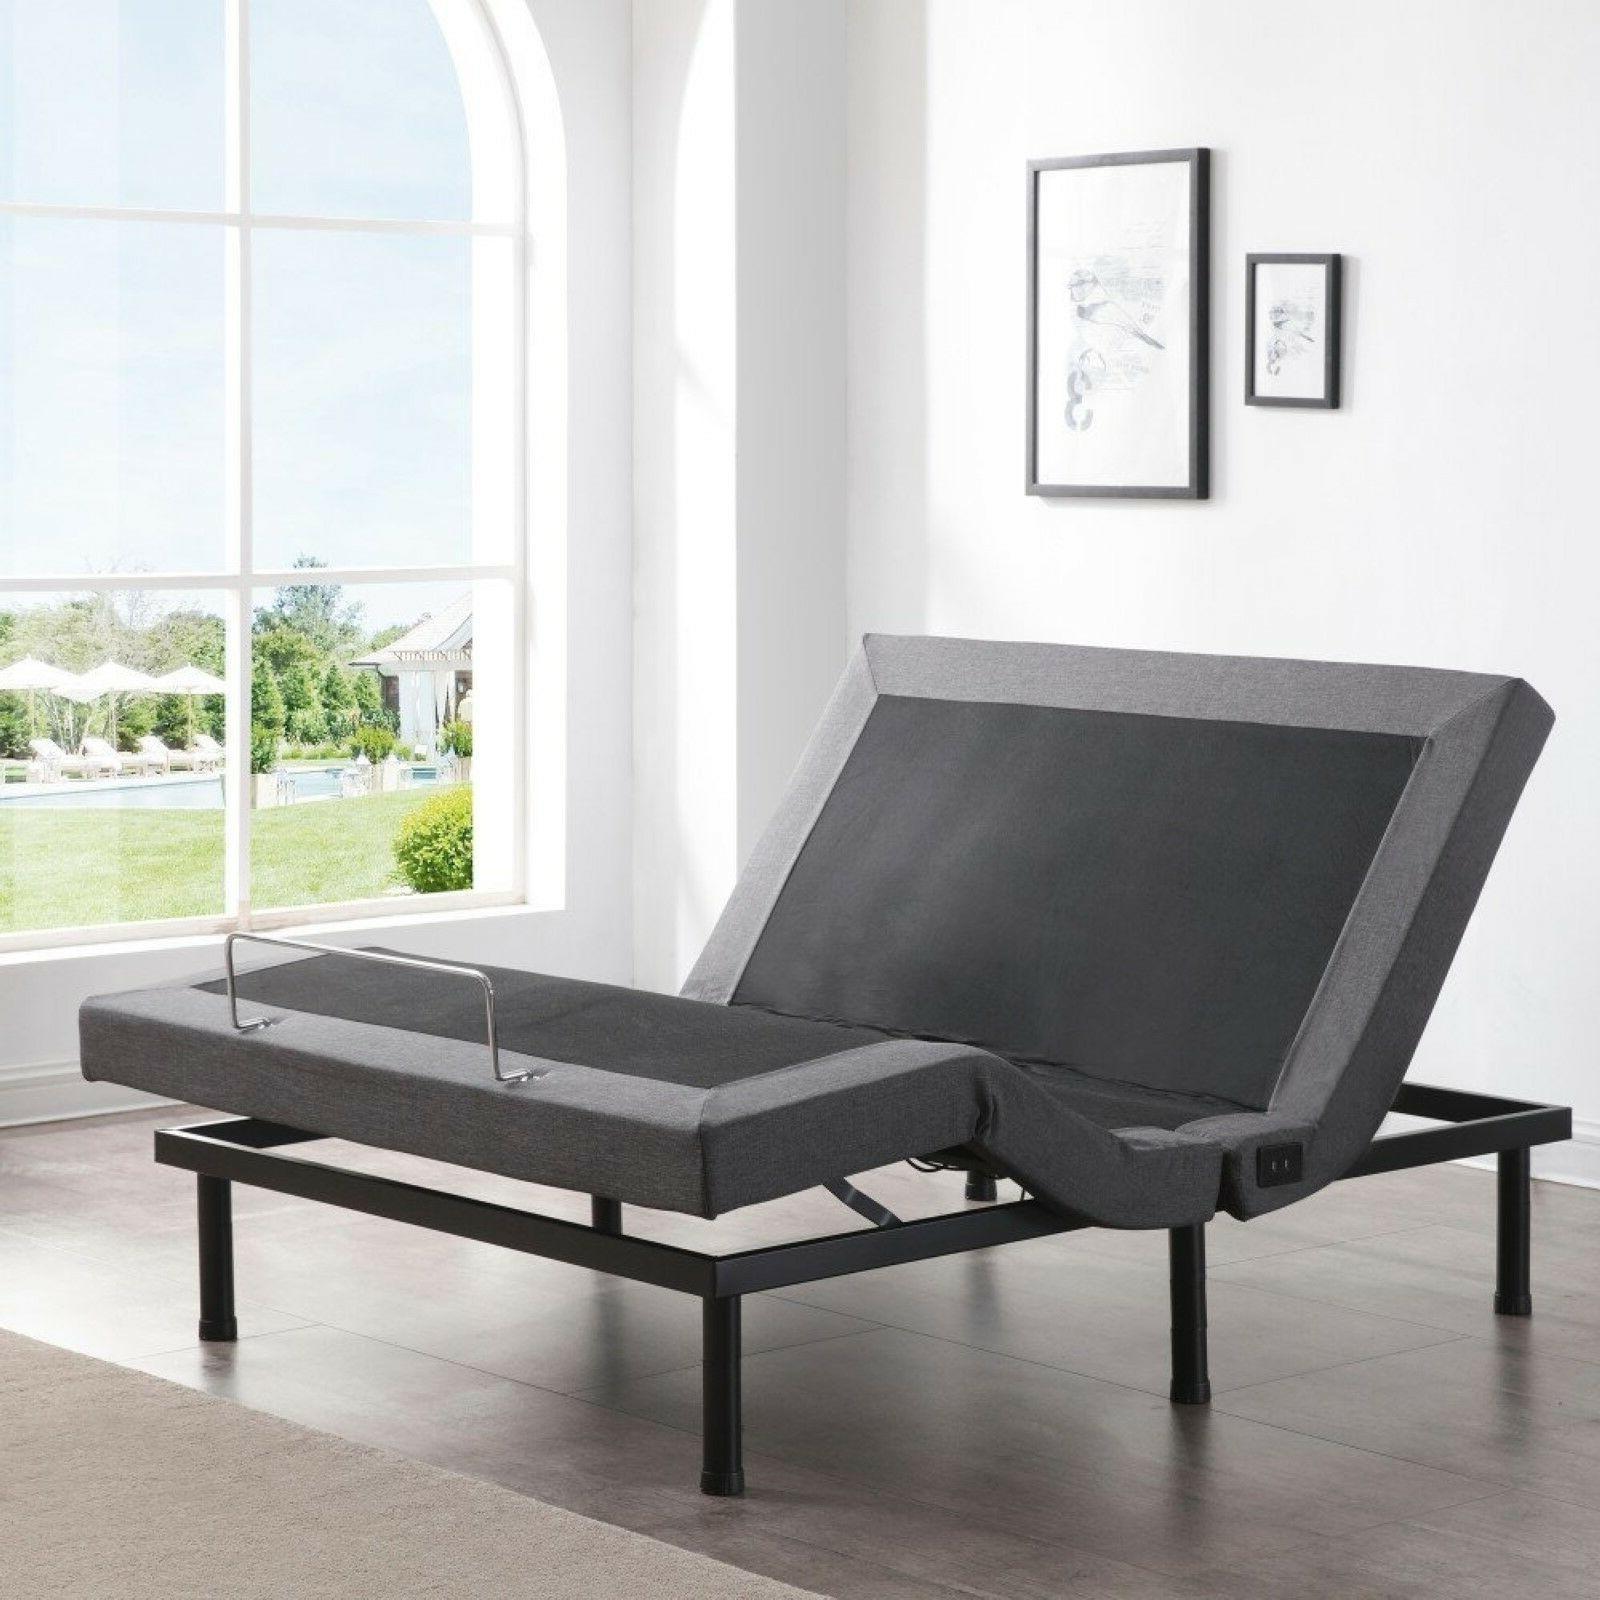 King Size Electric Bed Frame Zero Gravity Massage Remote Pow